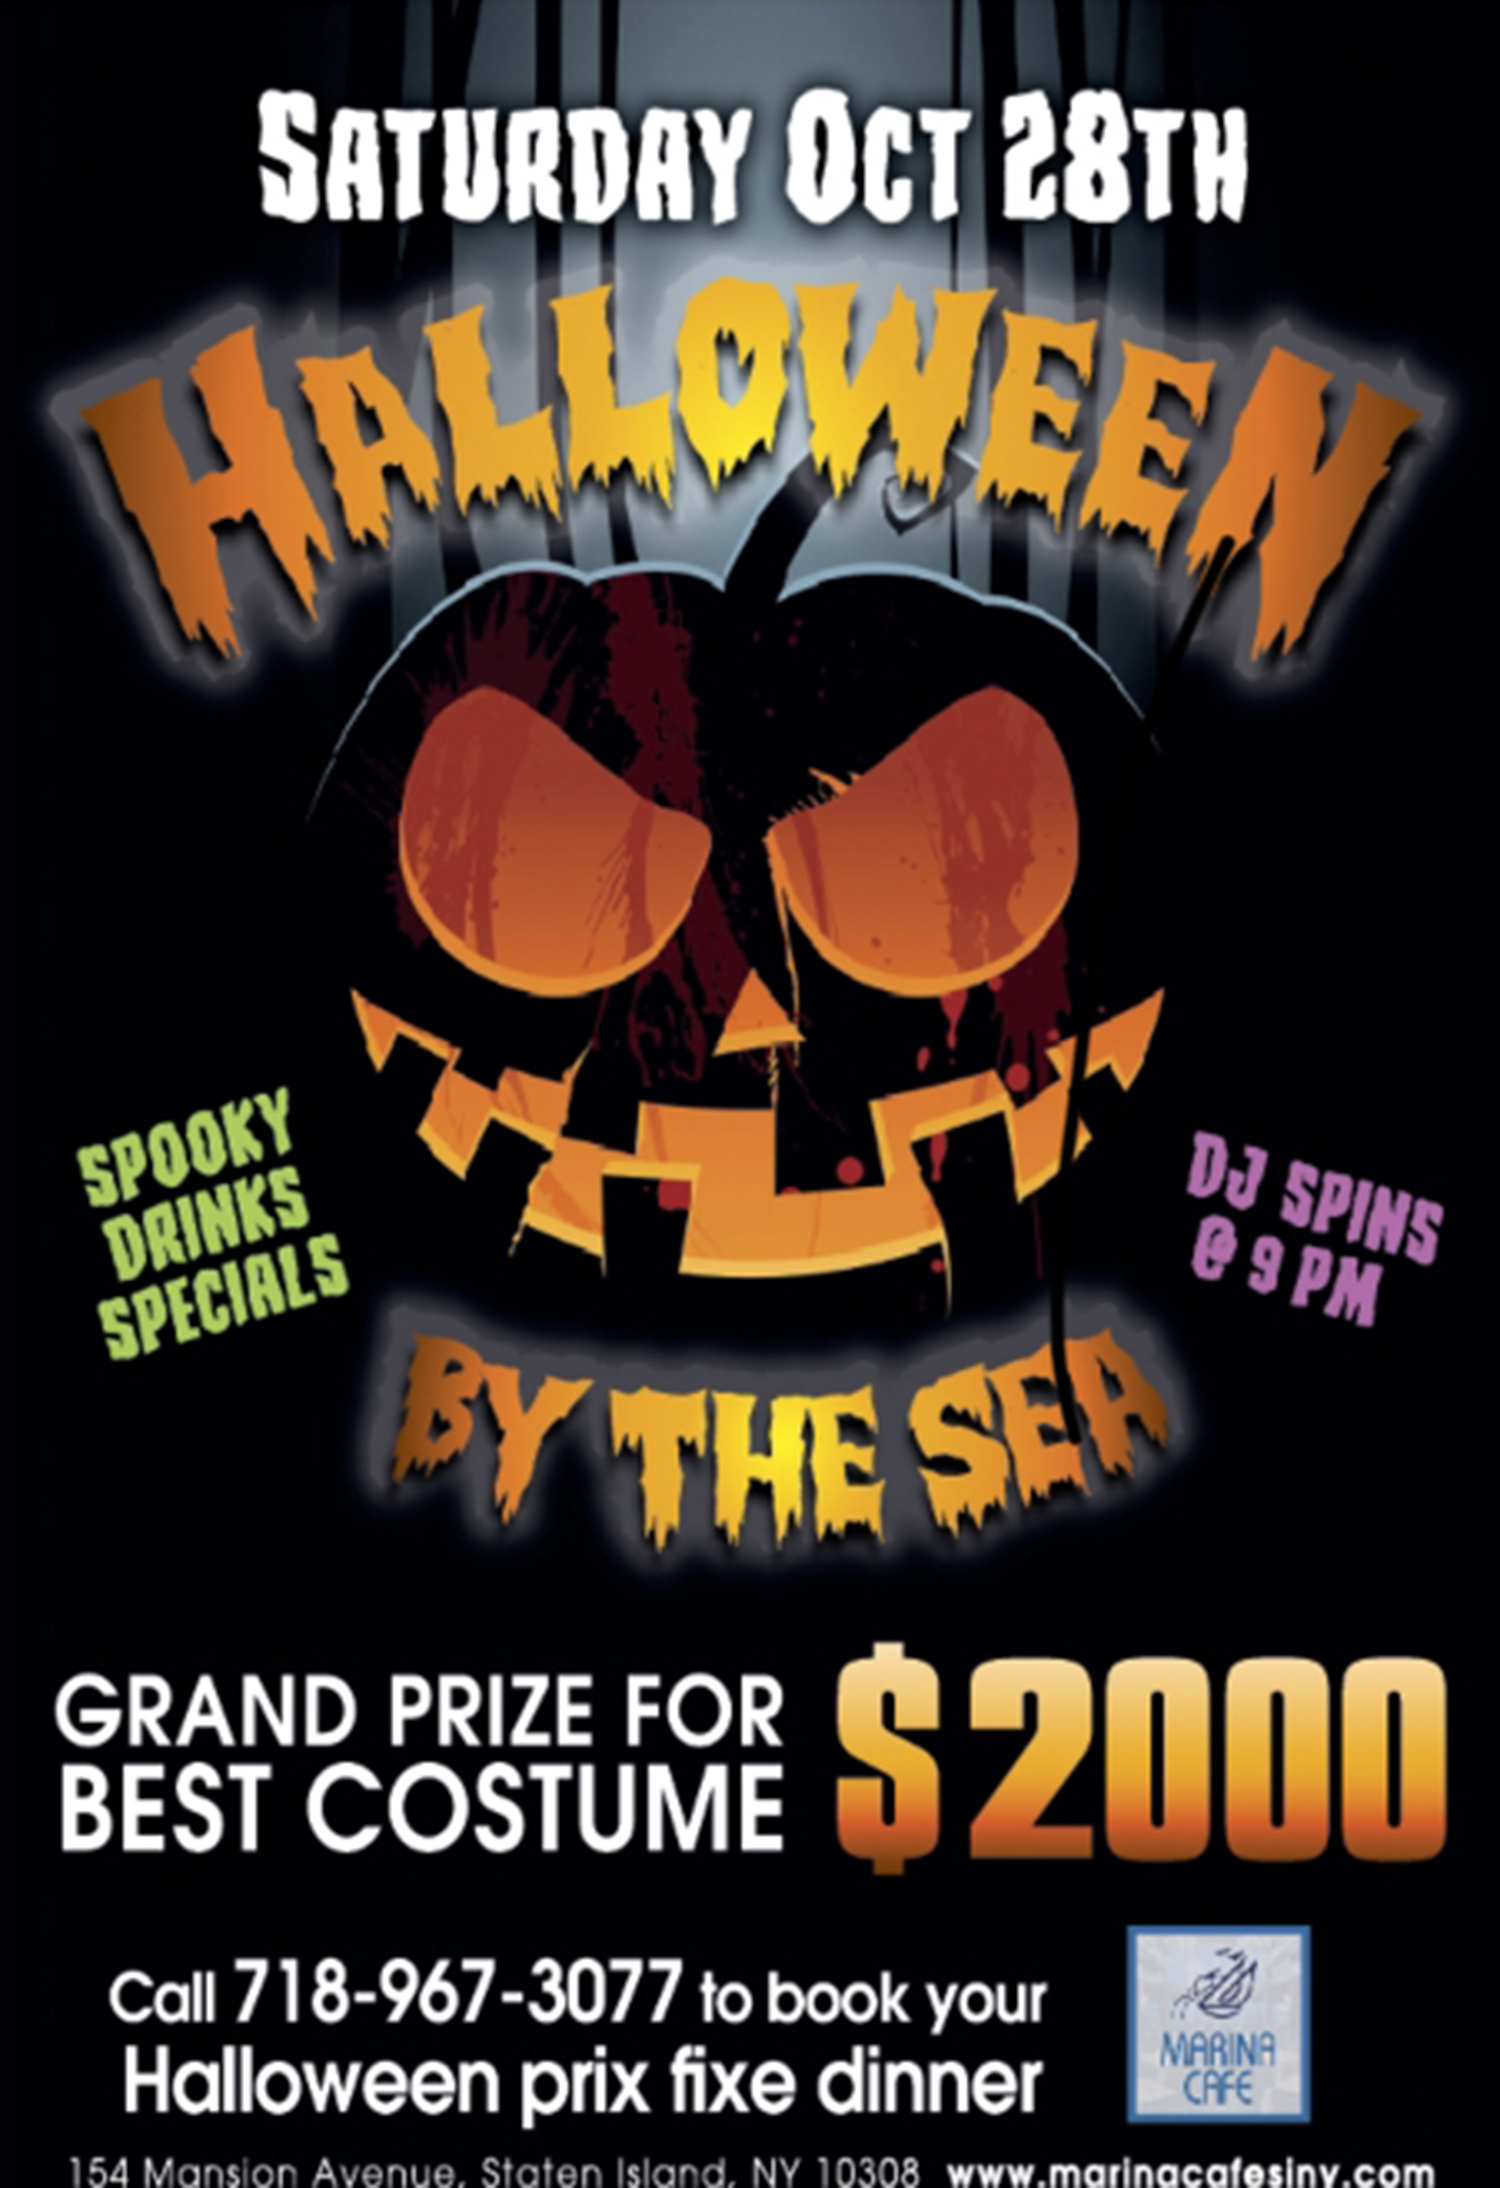 Staten Island Halloween Party 2017